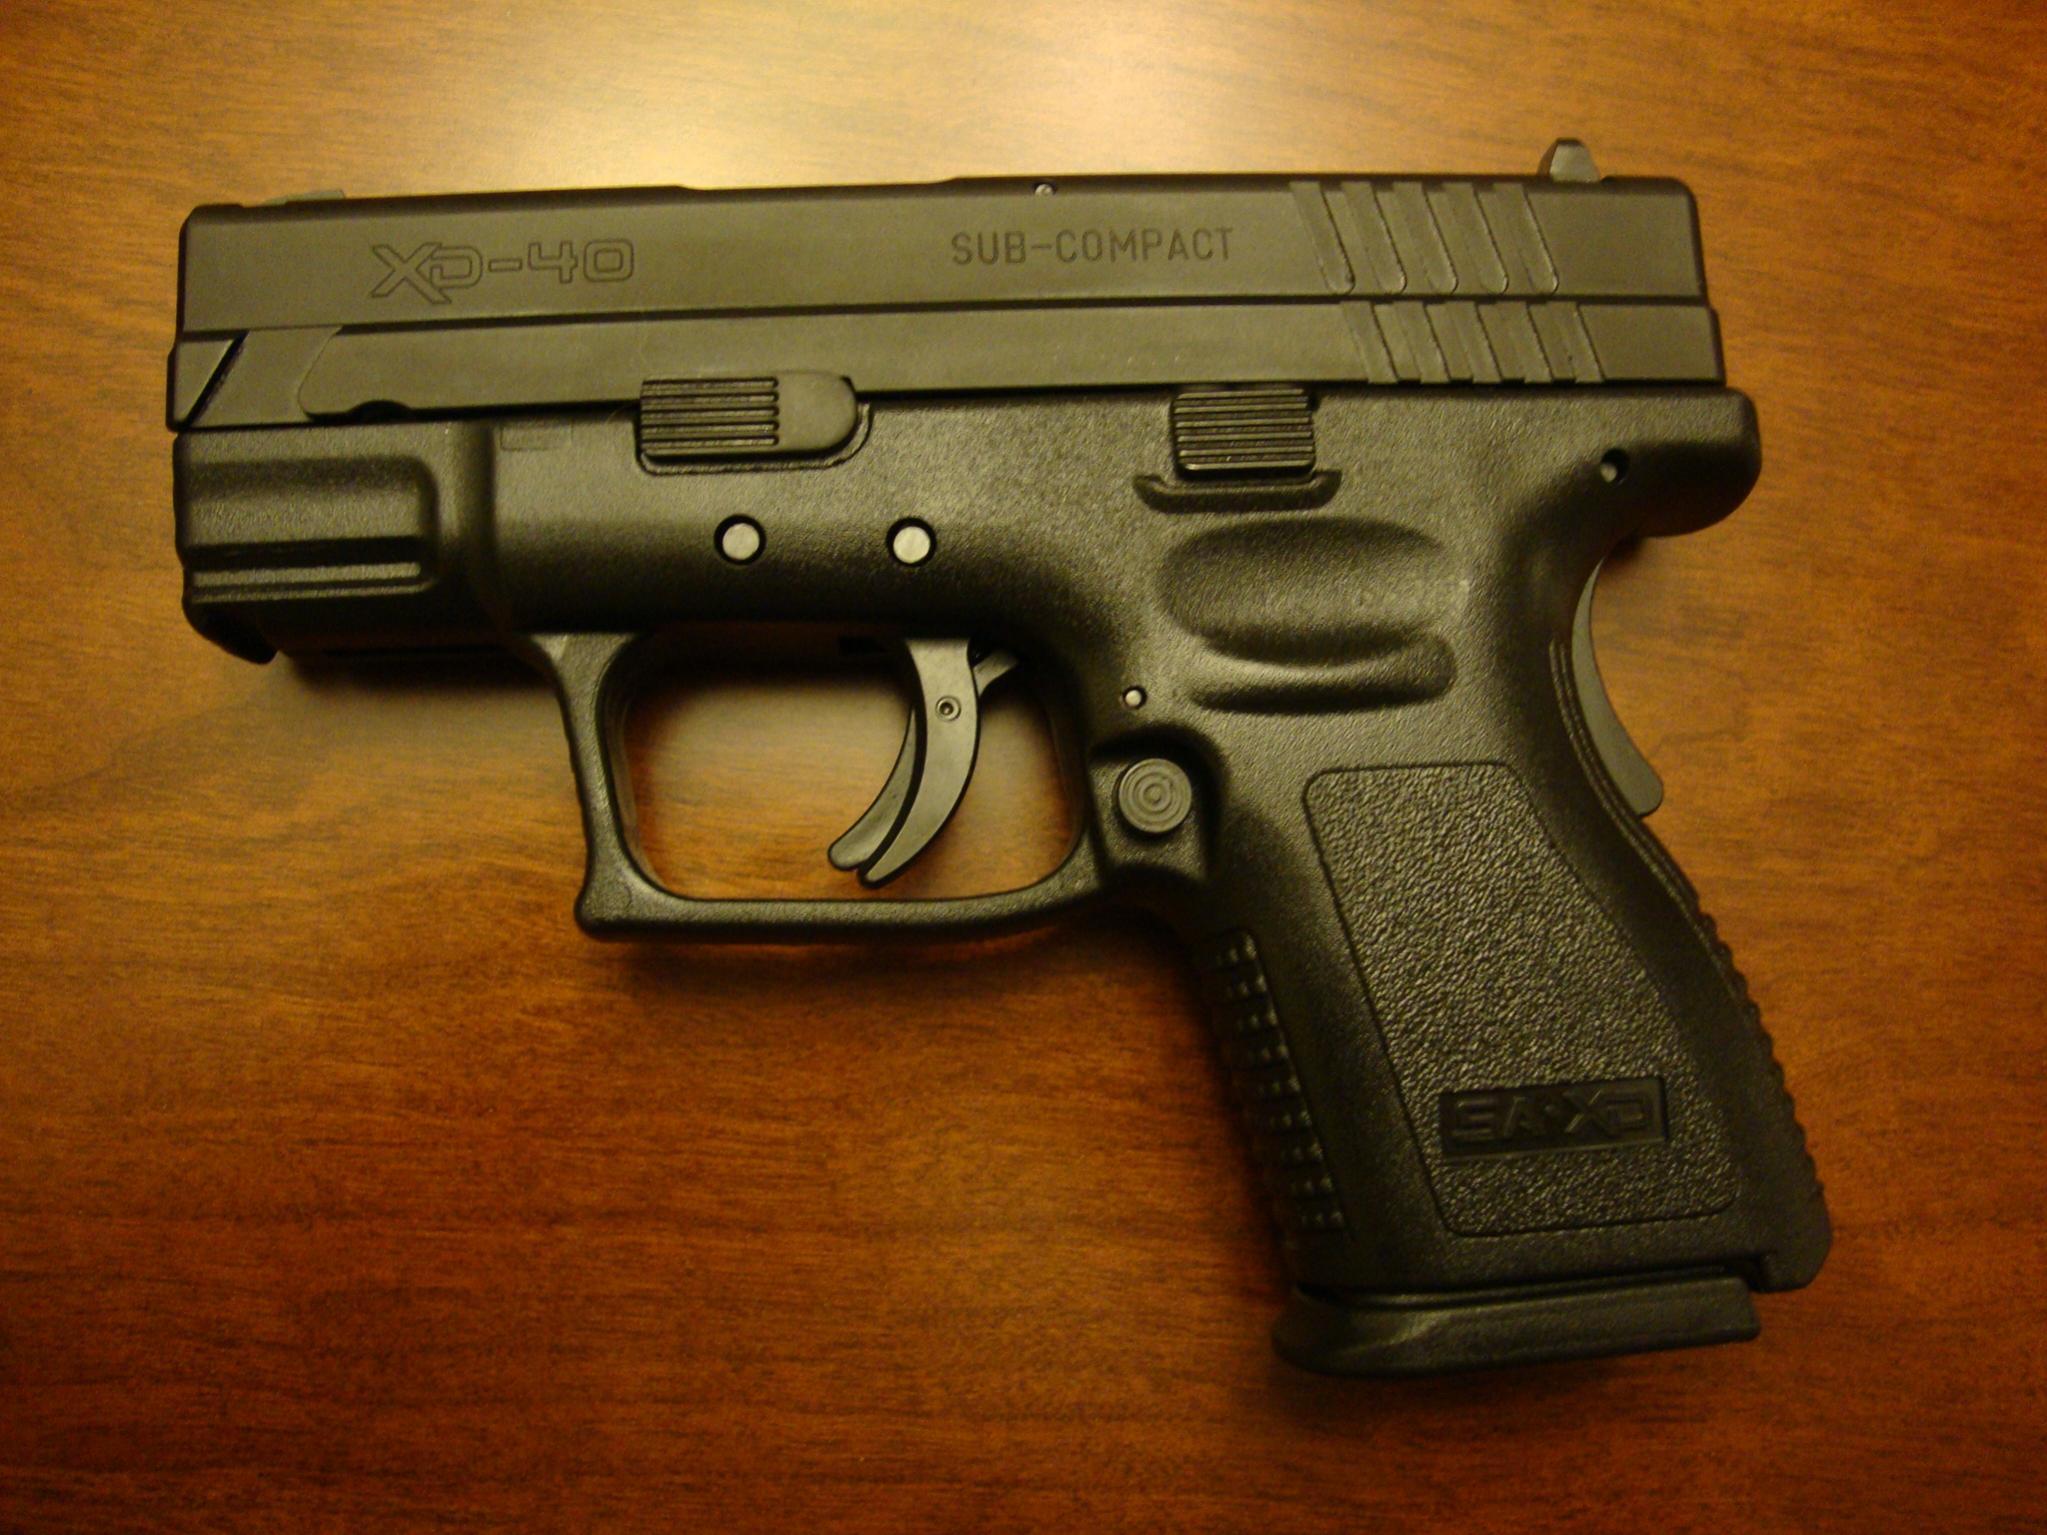 New Addition - 40 caliber-xd40subcompact1.jpg